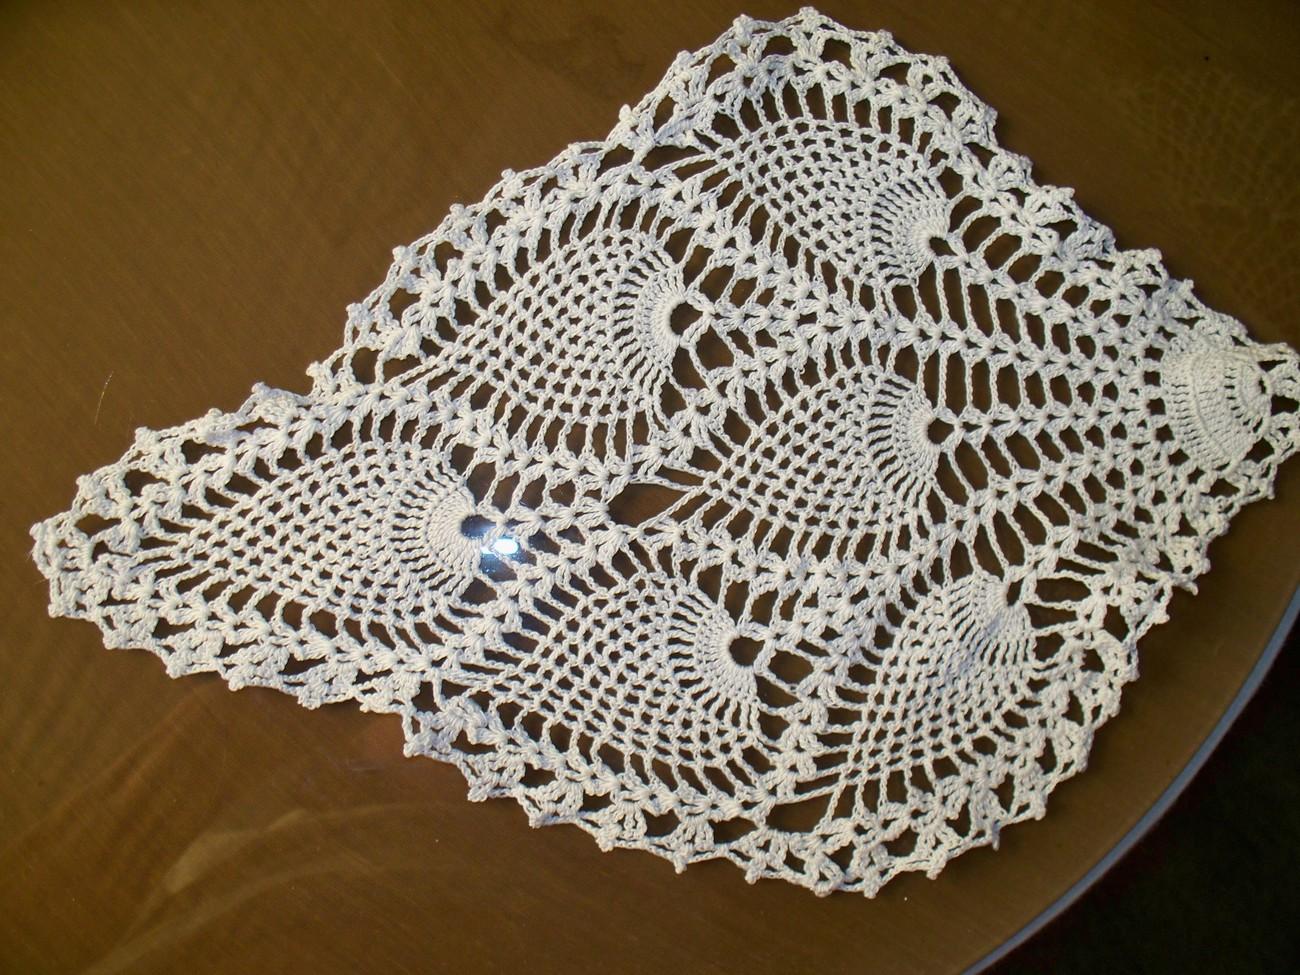 Crocheting Doilies : Handmade Crochet Doilies - Crochet Club